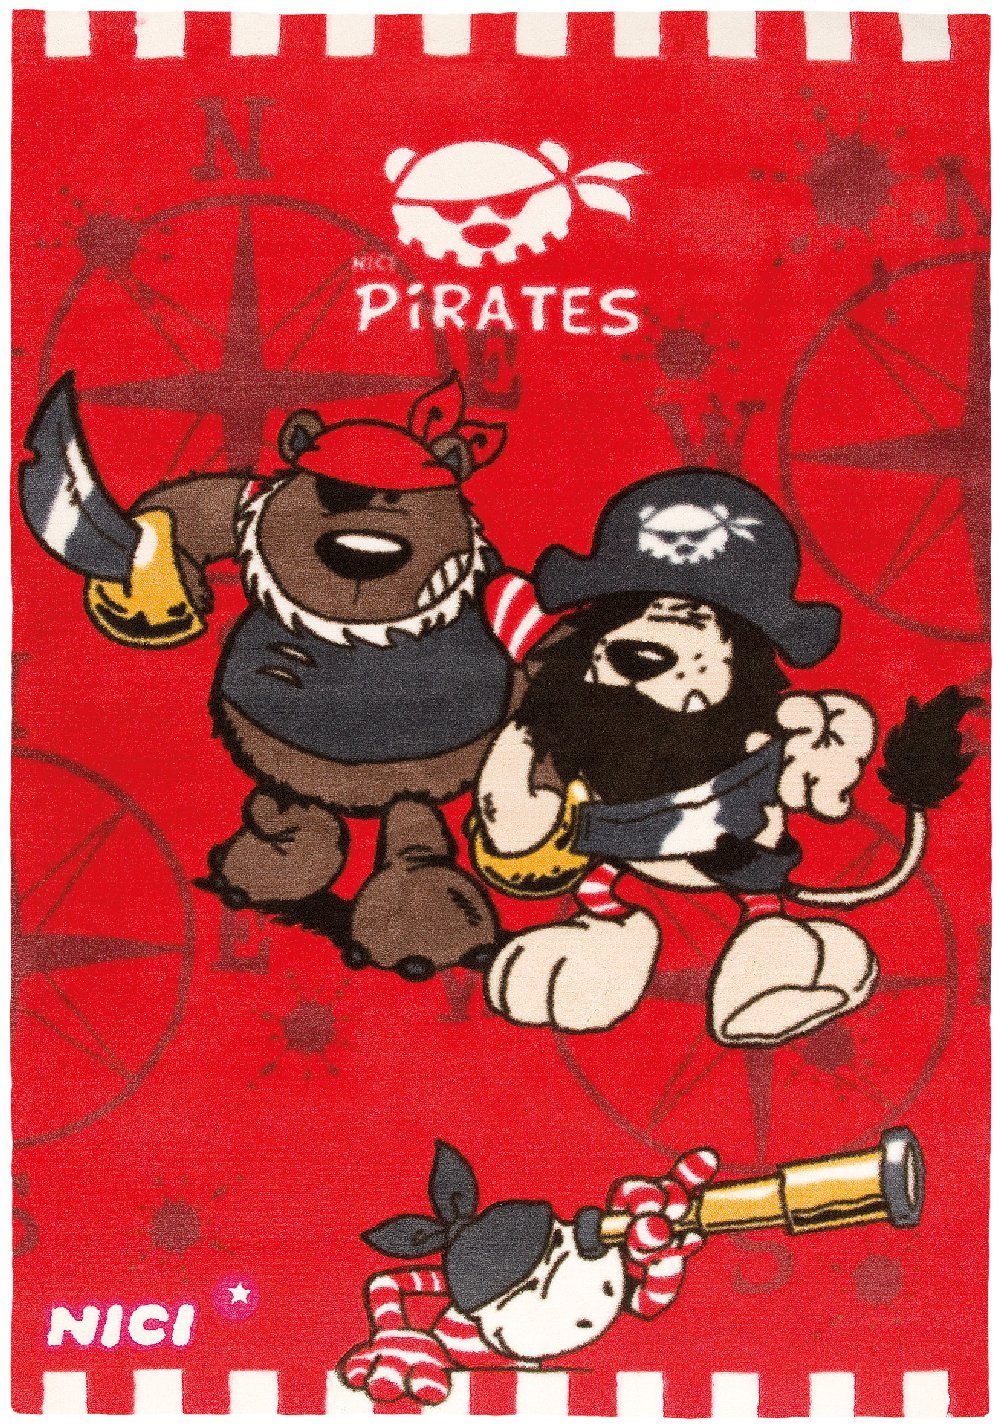 Wissenbach Kinderteppich Nici - Pirates - Piraten - rot